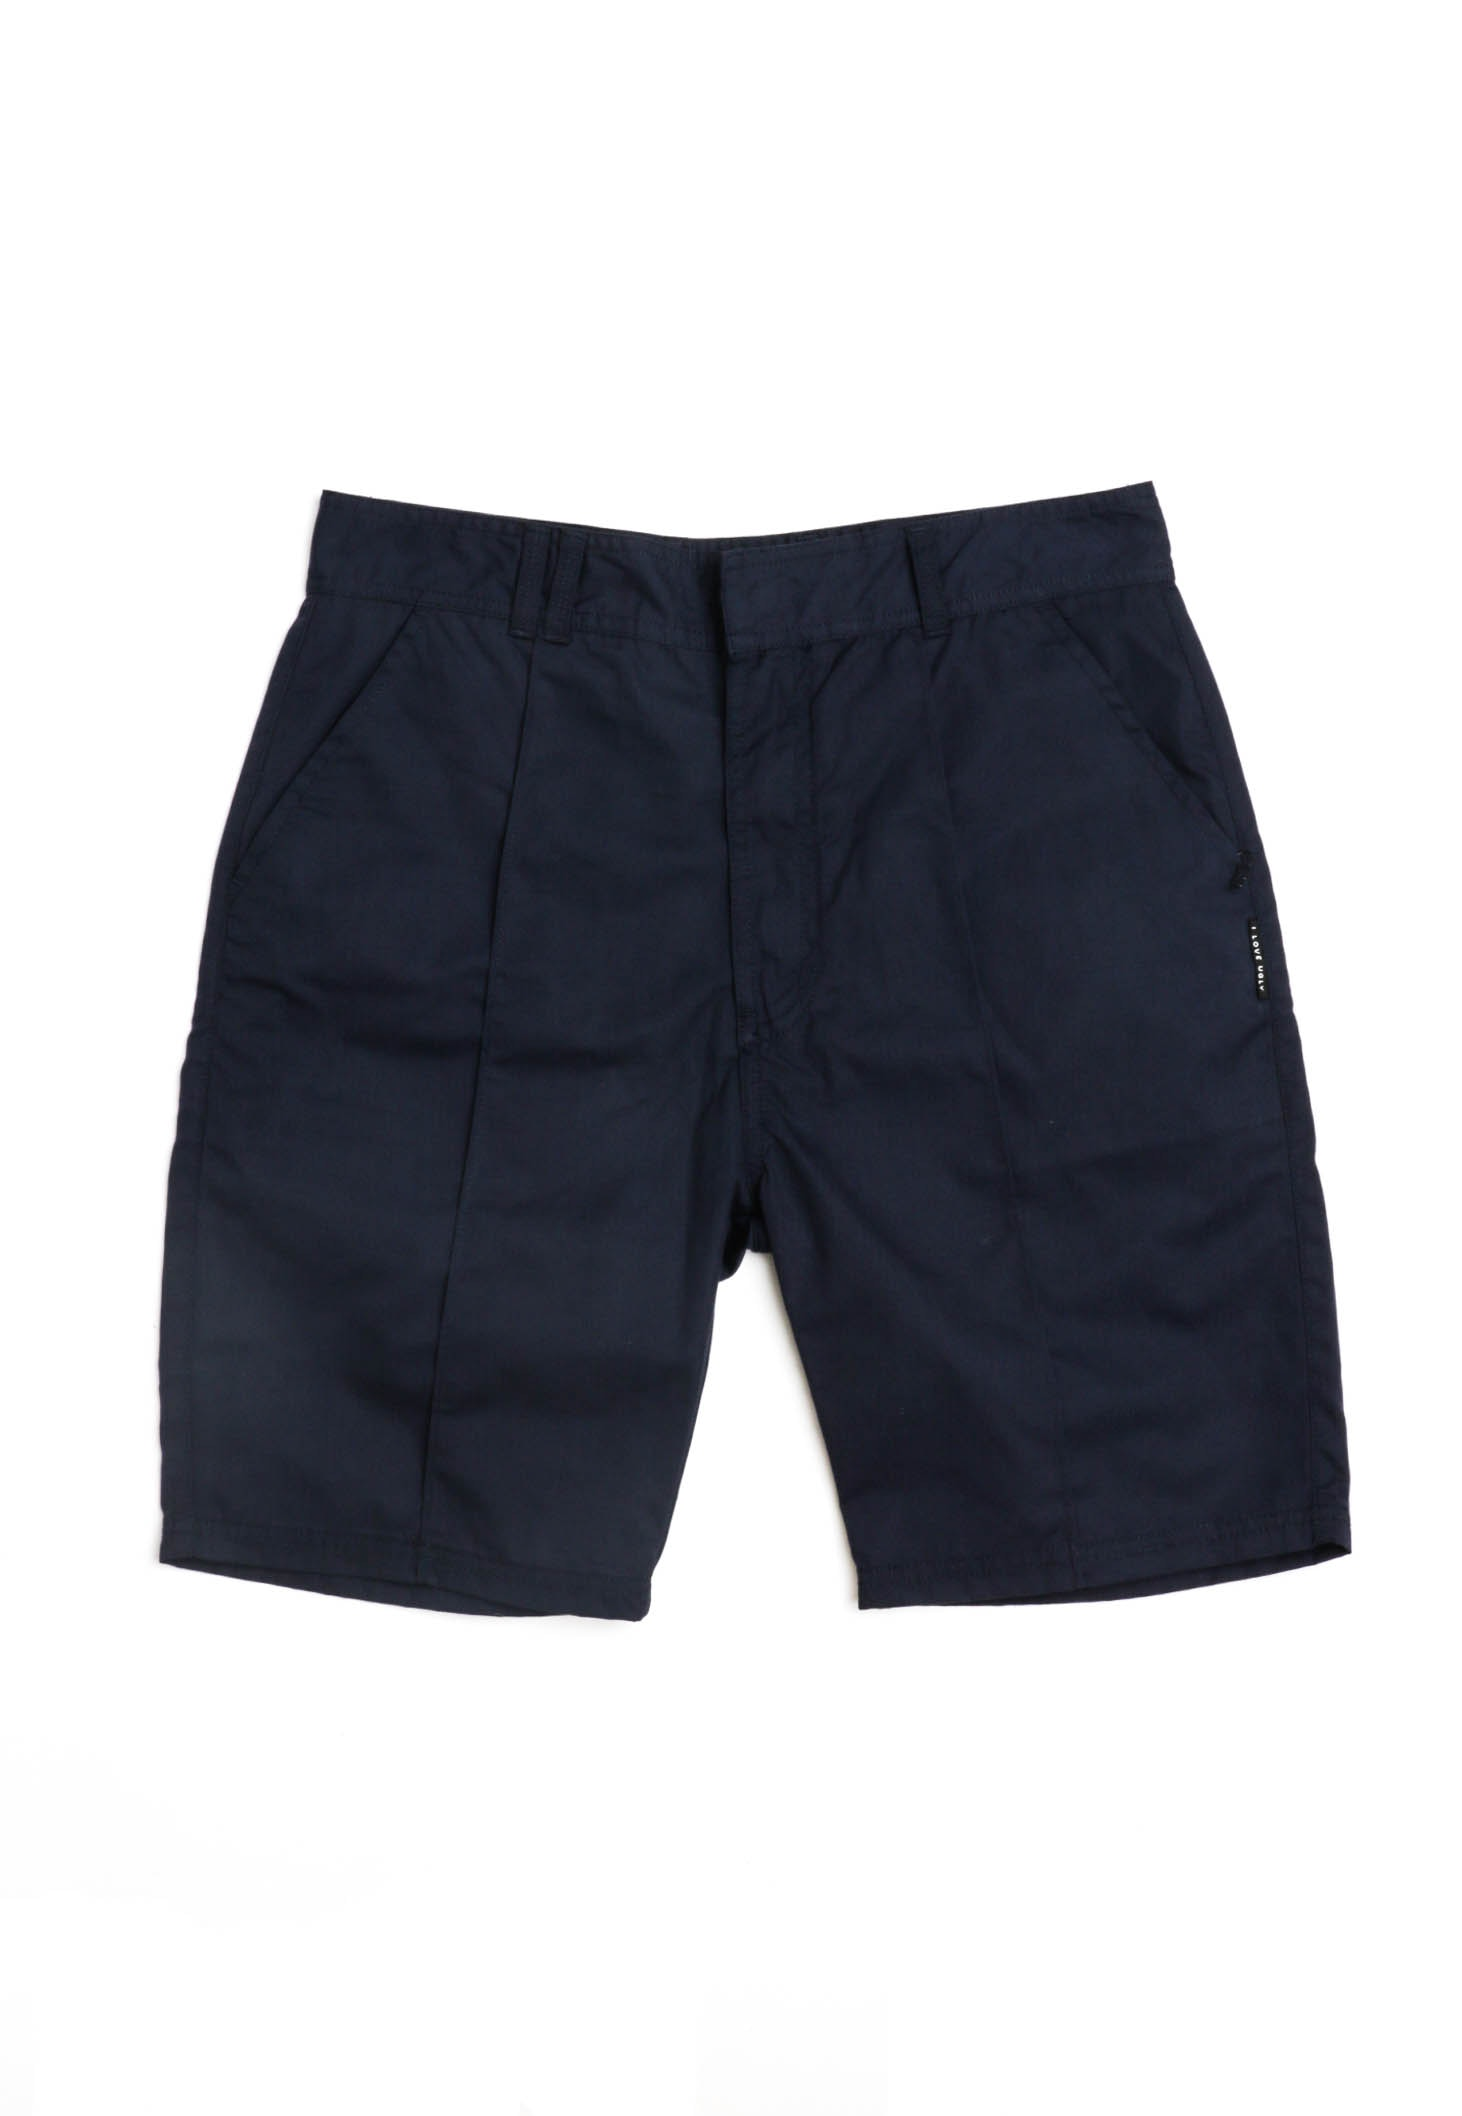 I Love Ugly - Dane Short - Navy